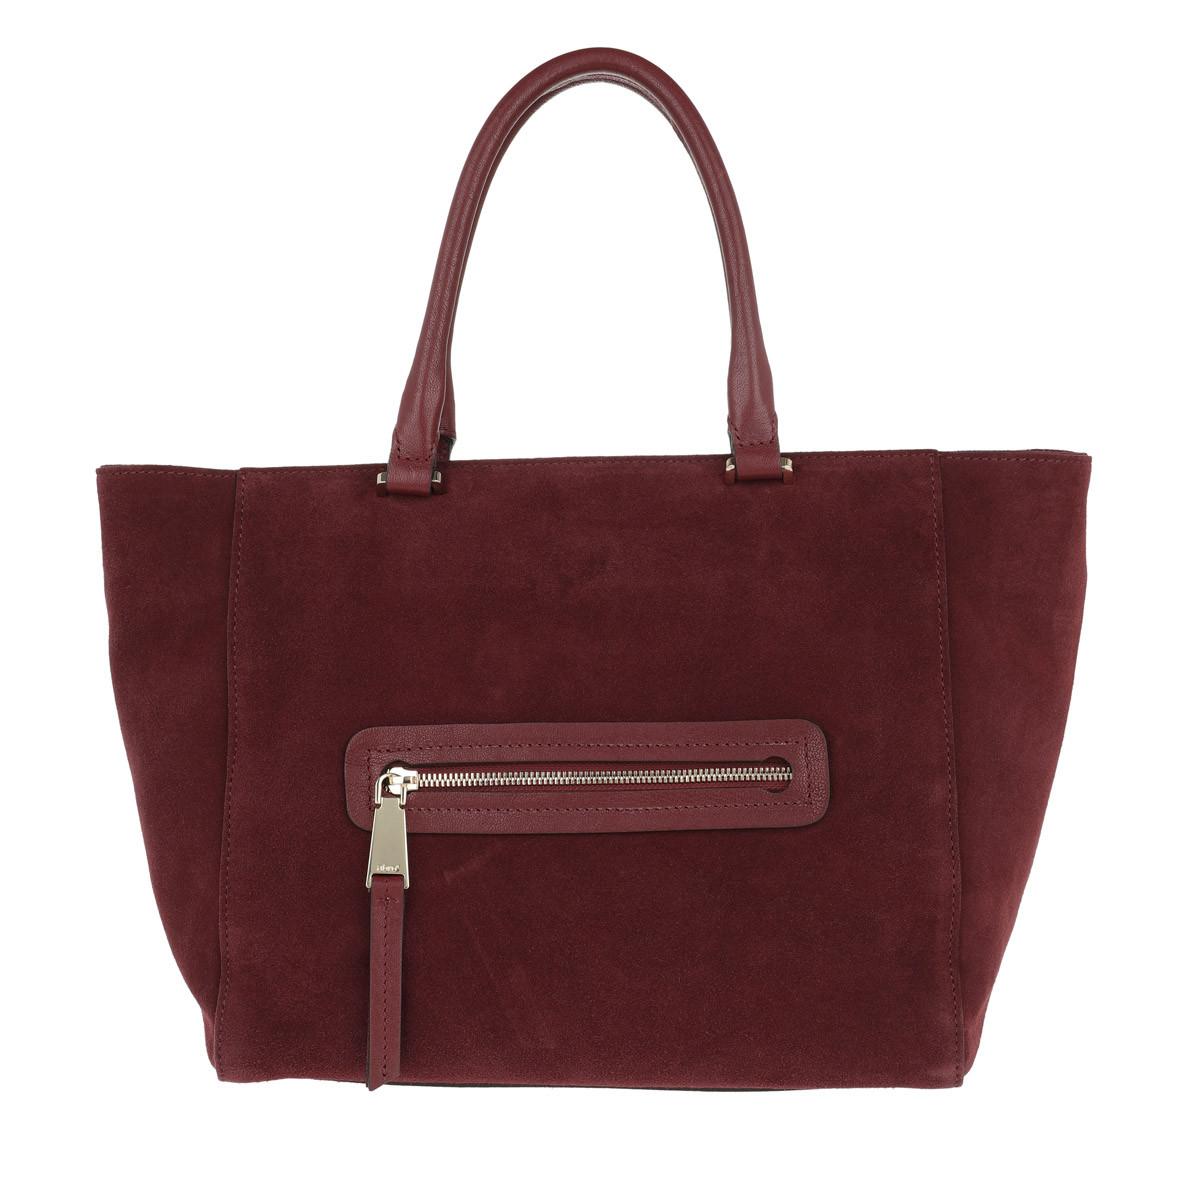 Abro Tote - Suede Handle Shopper Rust - in rot - für Damen